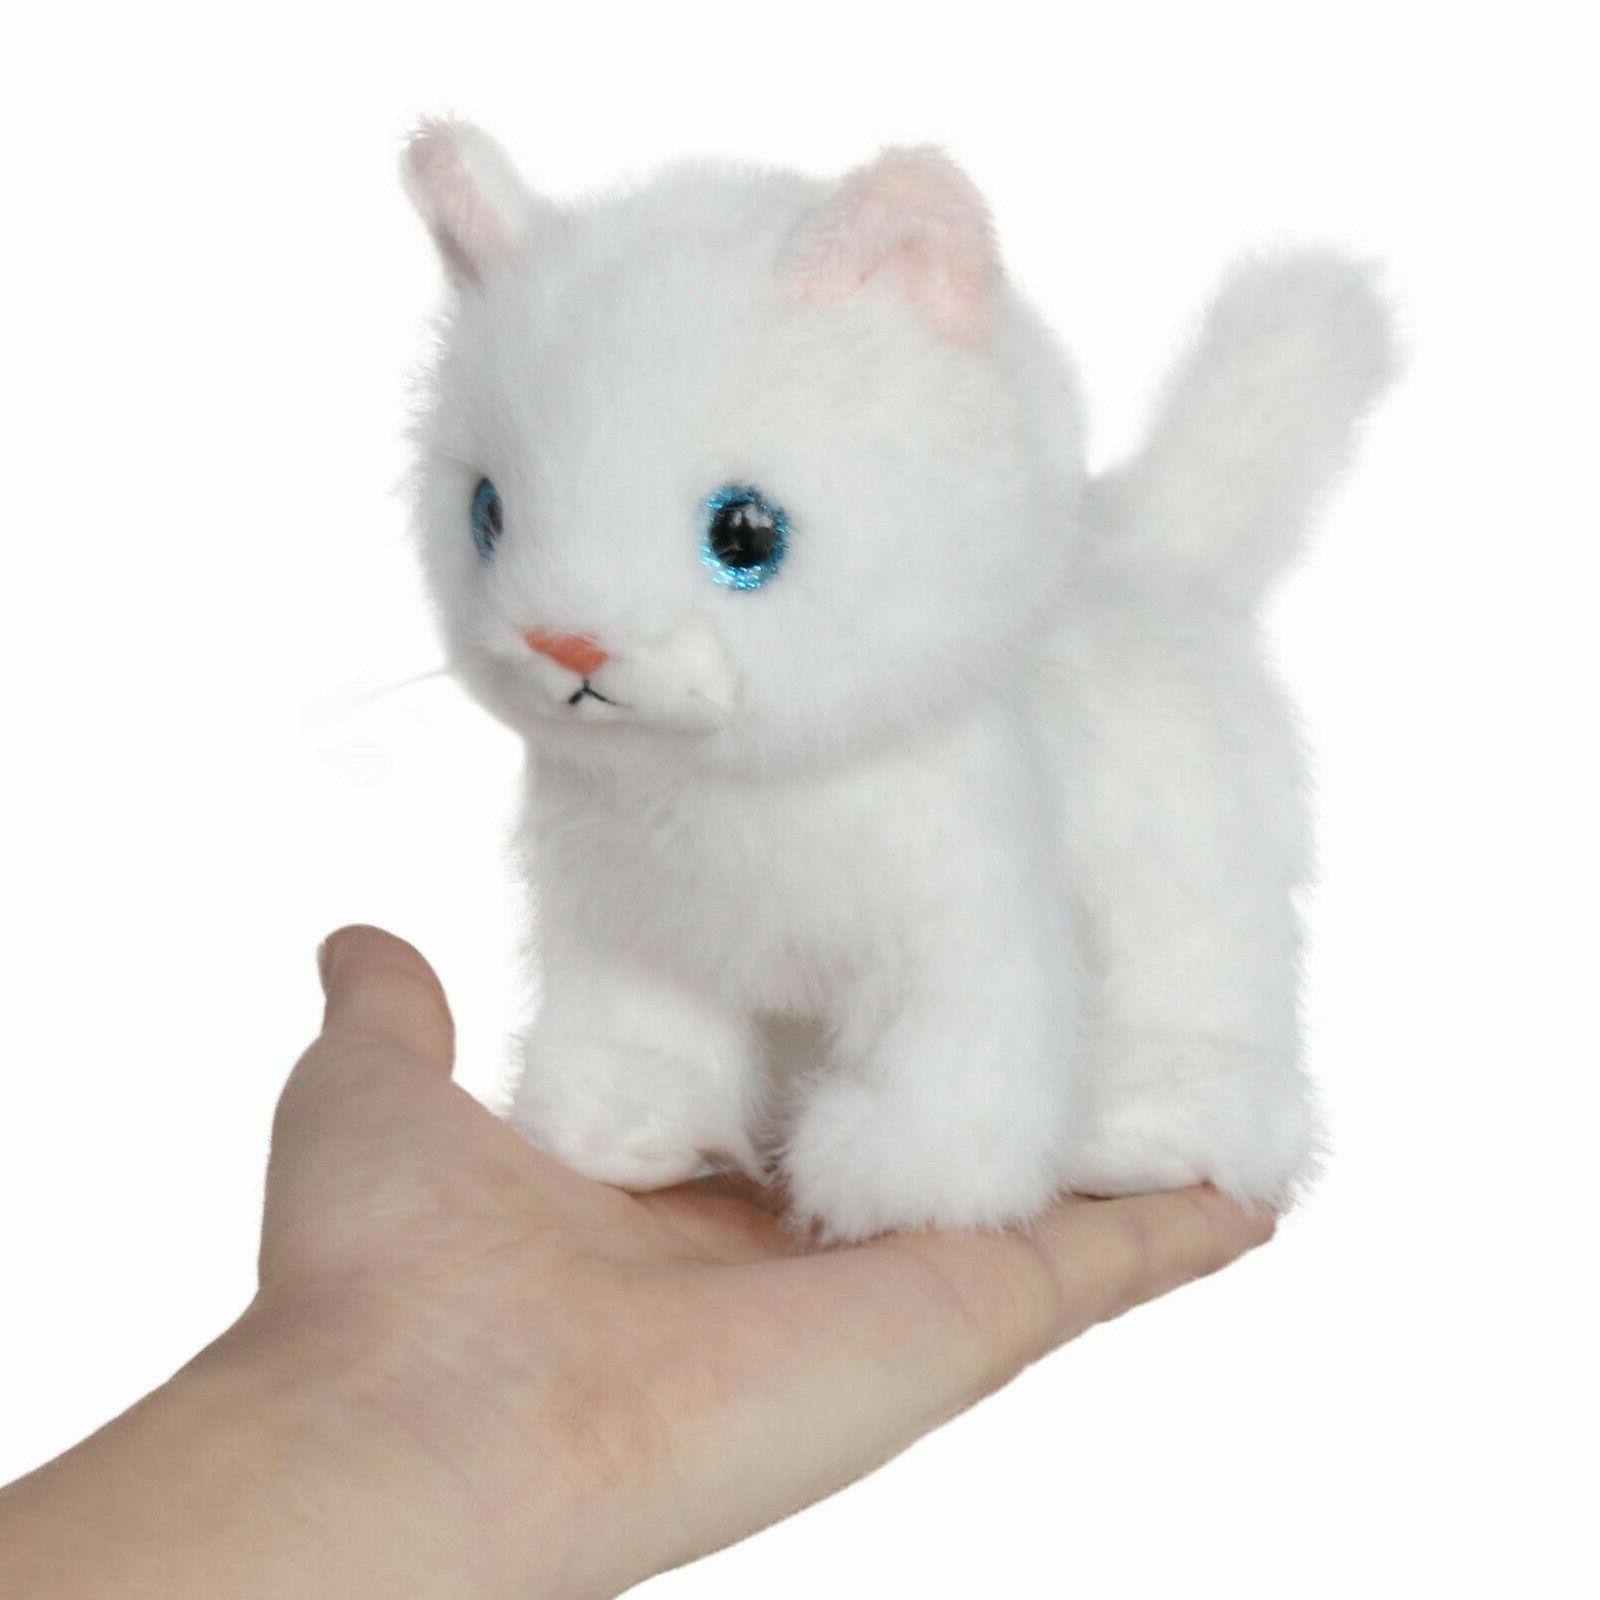 fluffy little cat stuffed animal toy 6